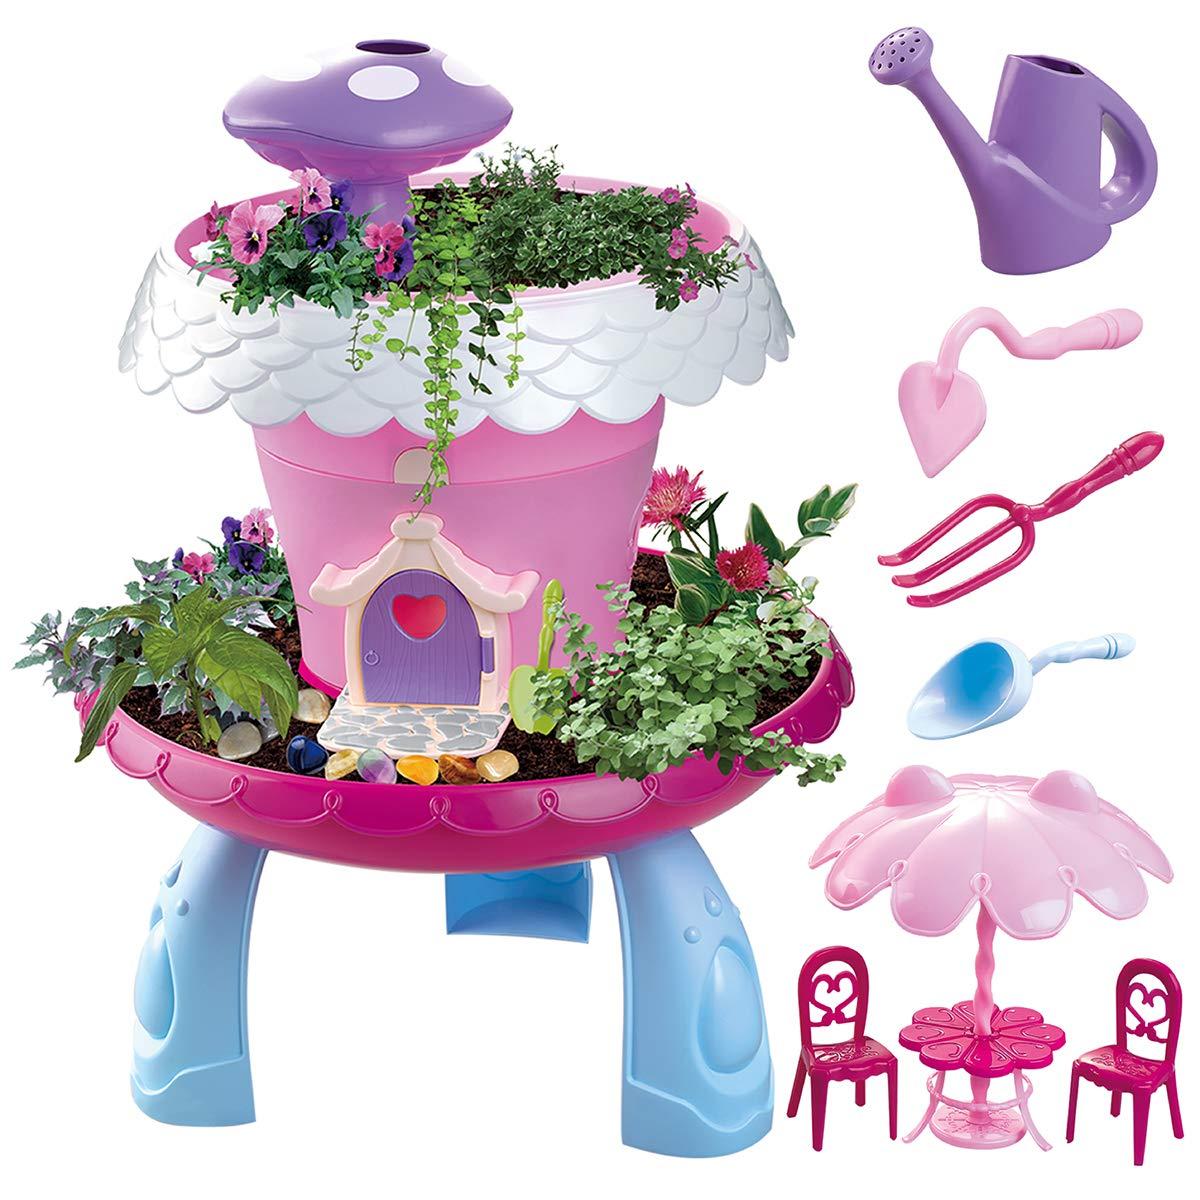 Maxxrace My Happy Garden Tools Toys, STEM Toys DIY Assembly Toys for Kids, Grow Your Own Garden Toys